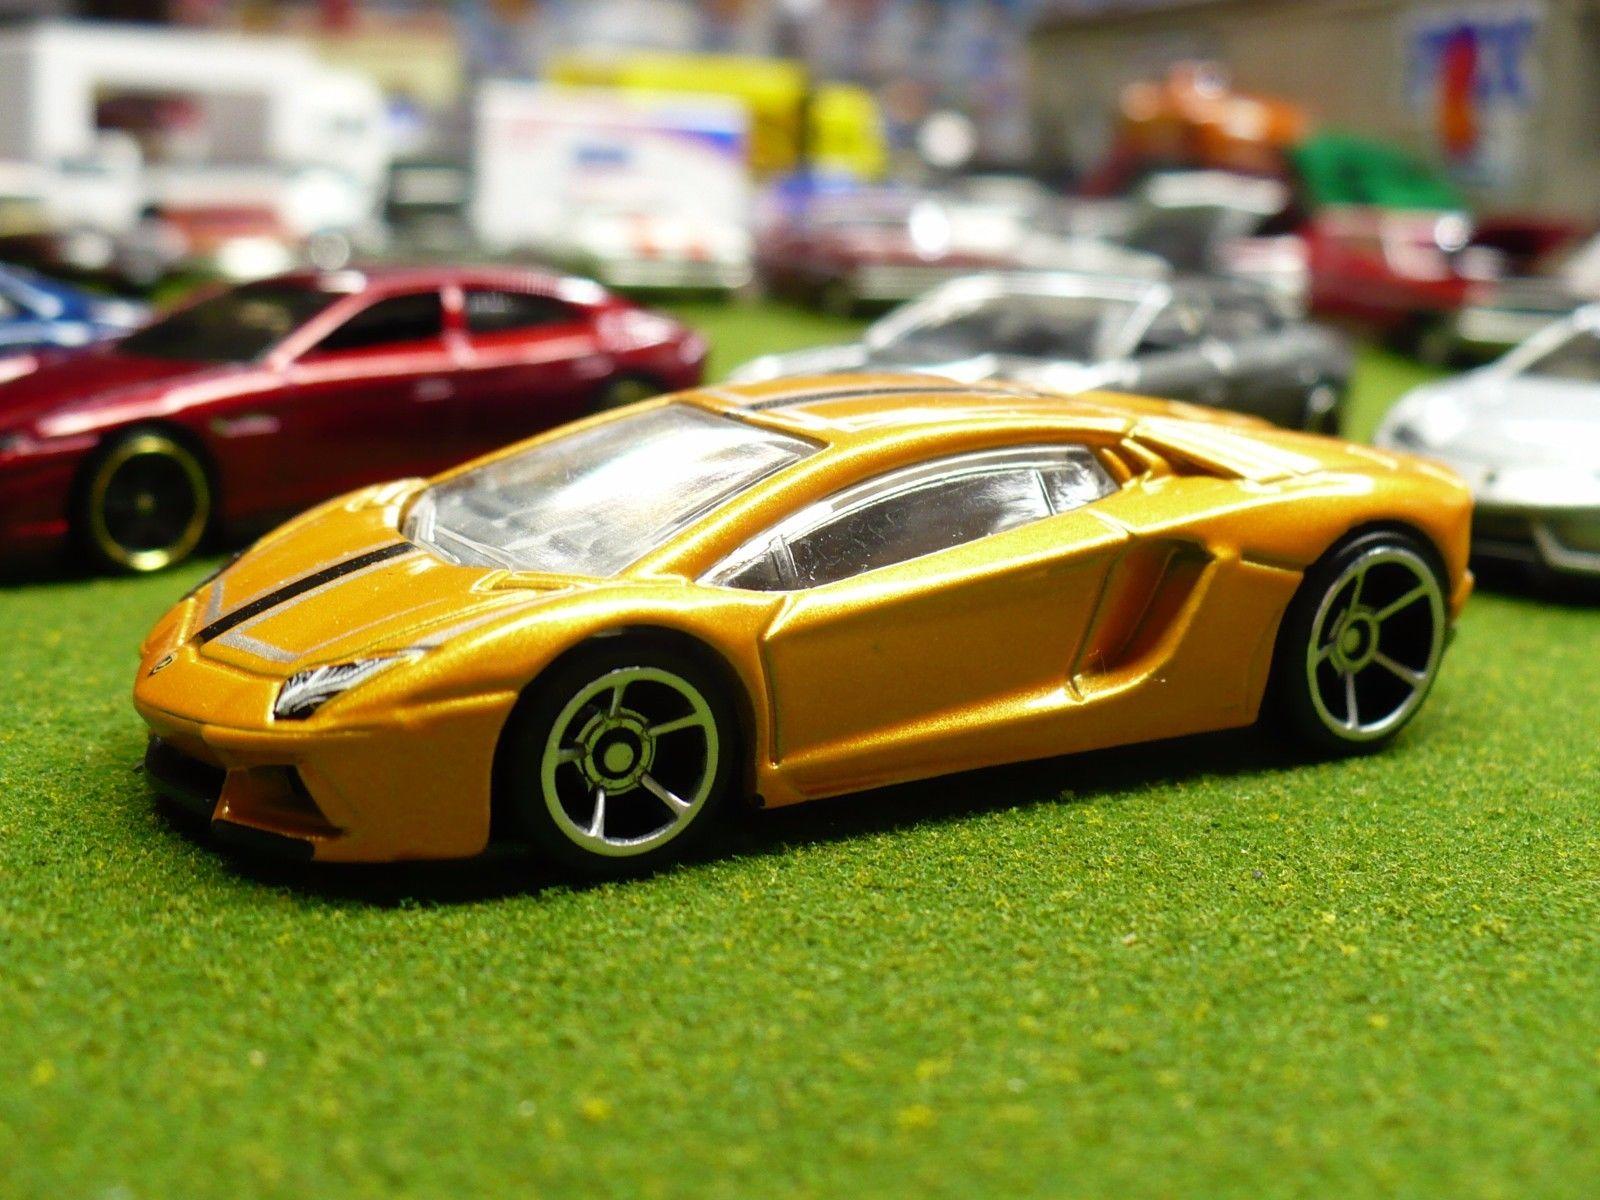 Awesome 2011 Lamborghini Aventador Lp 700 4 Metallic Orange On Tlc